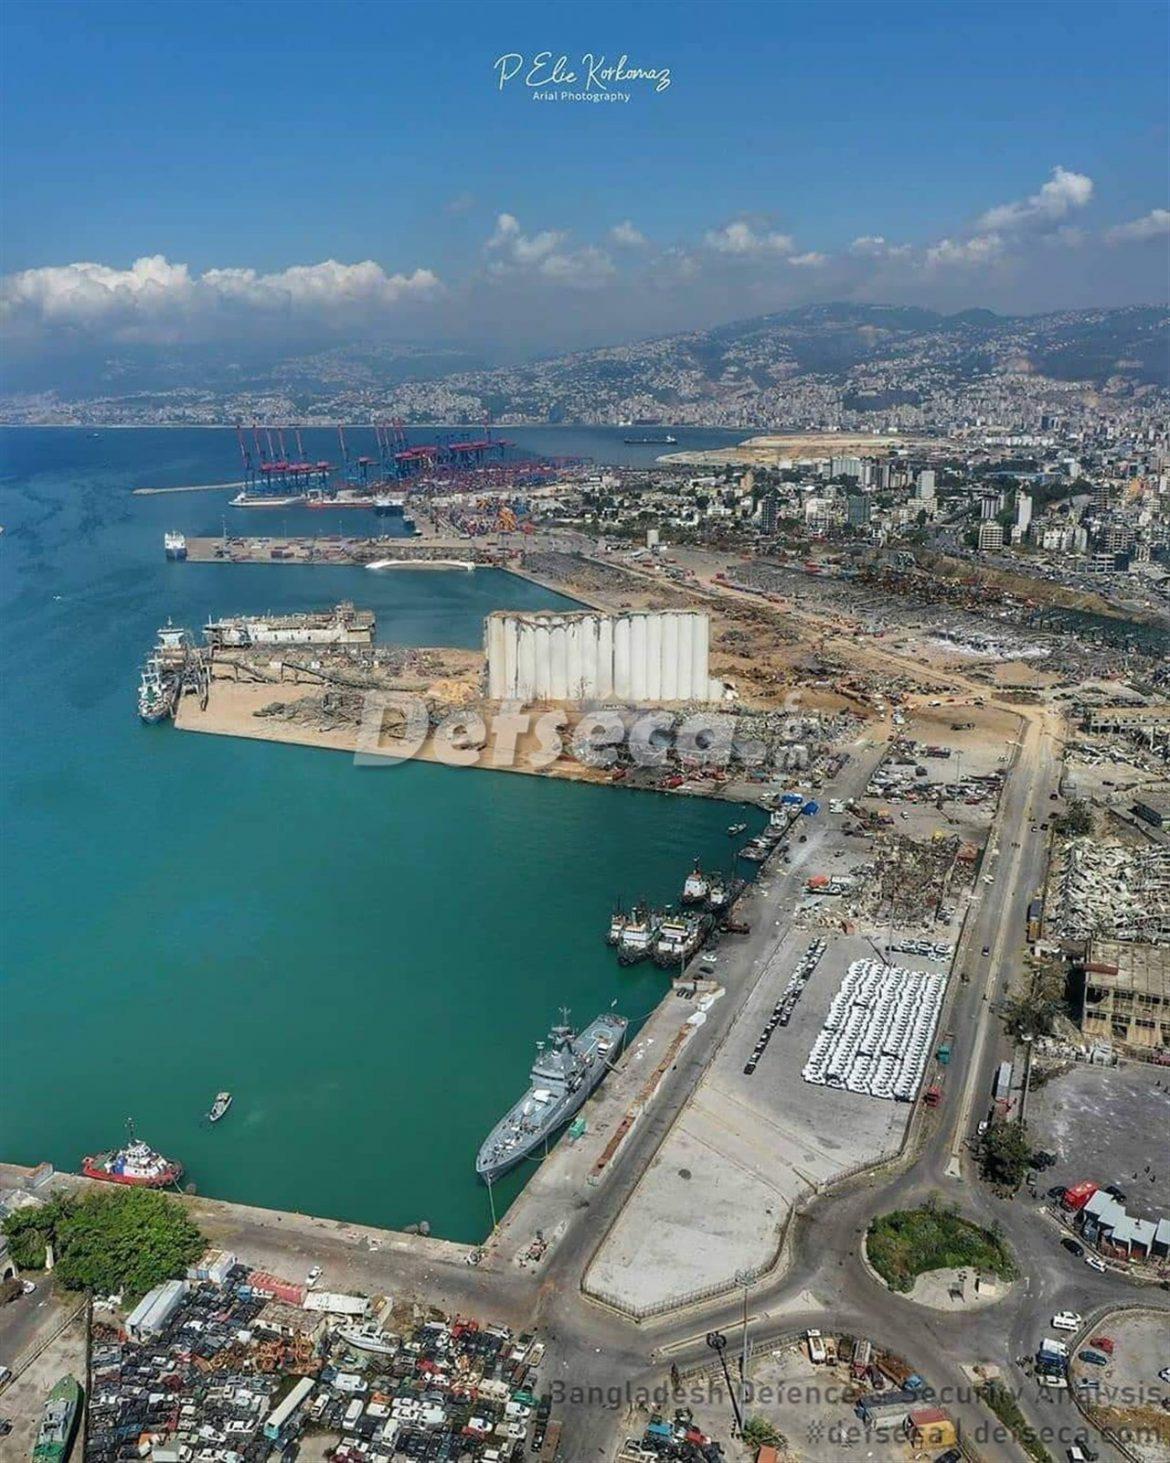 Bangladesh to send medical team, aid to Lebanon